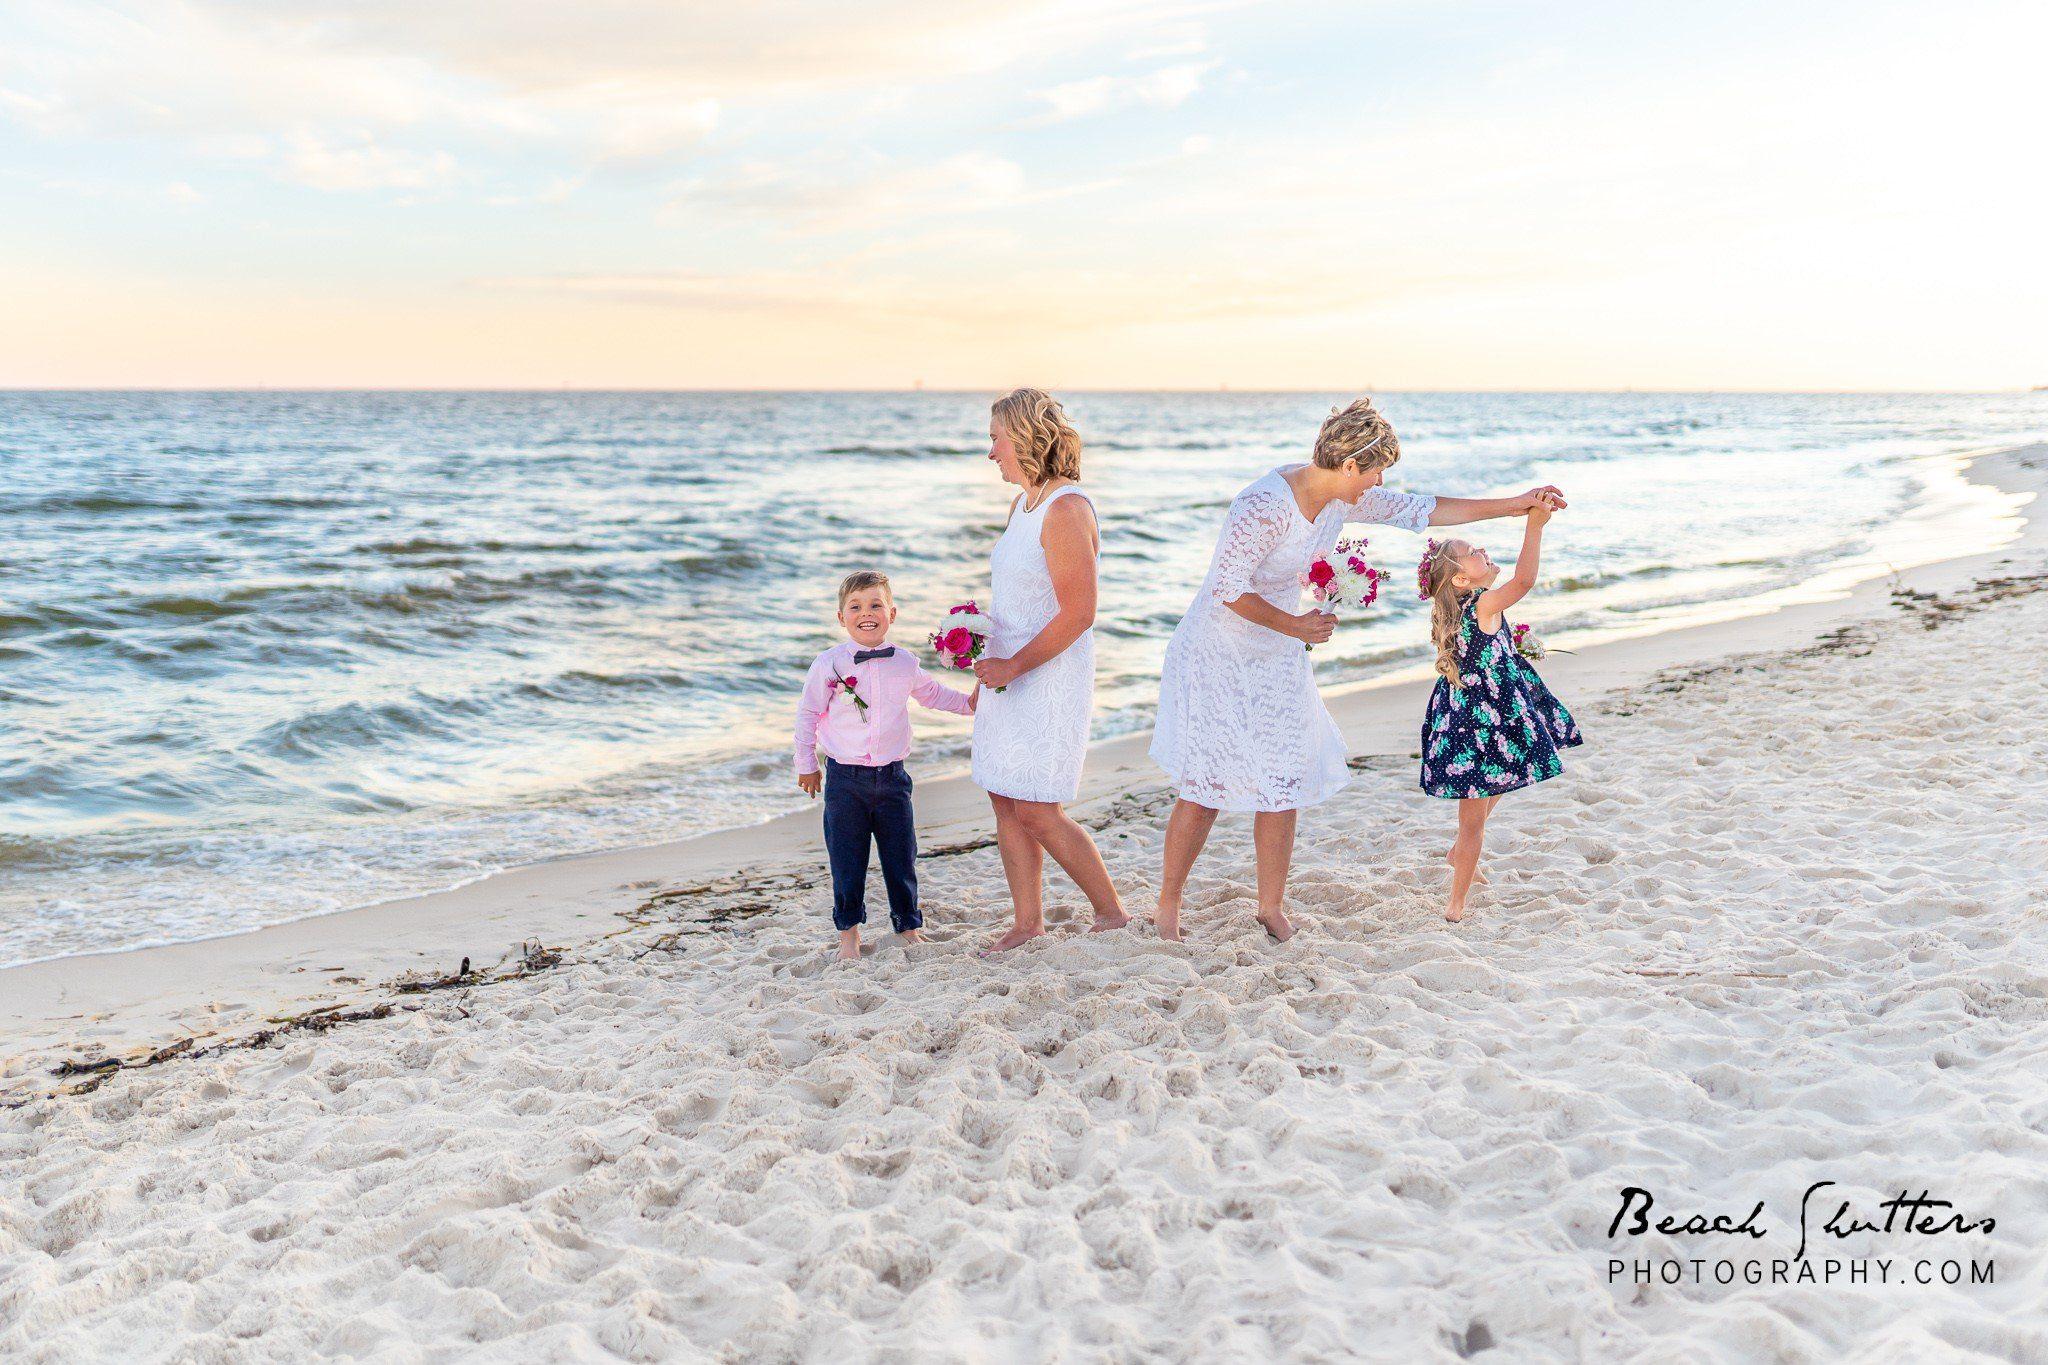 beach weddings in Gulf Shores Alabama